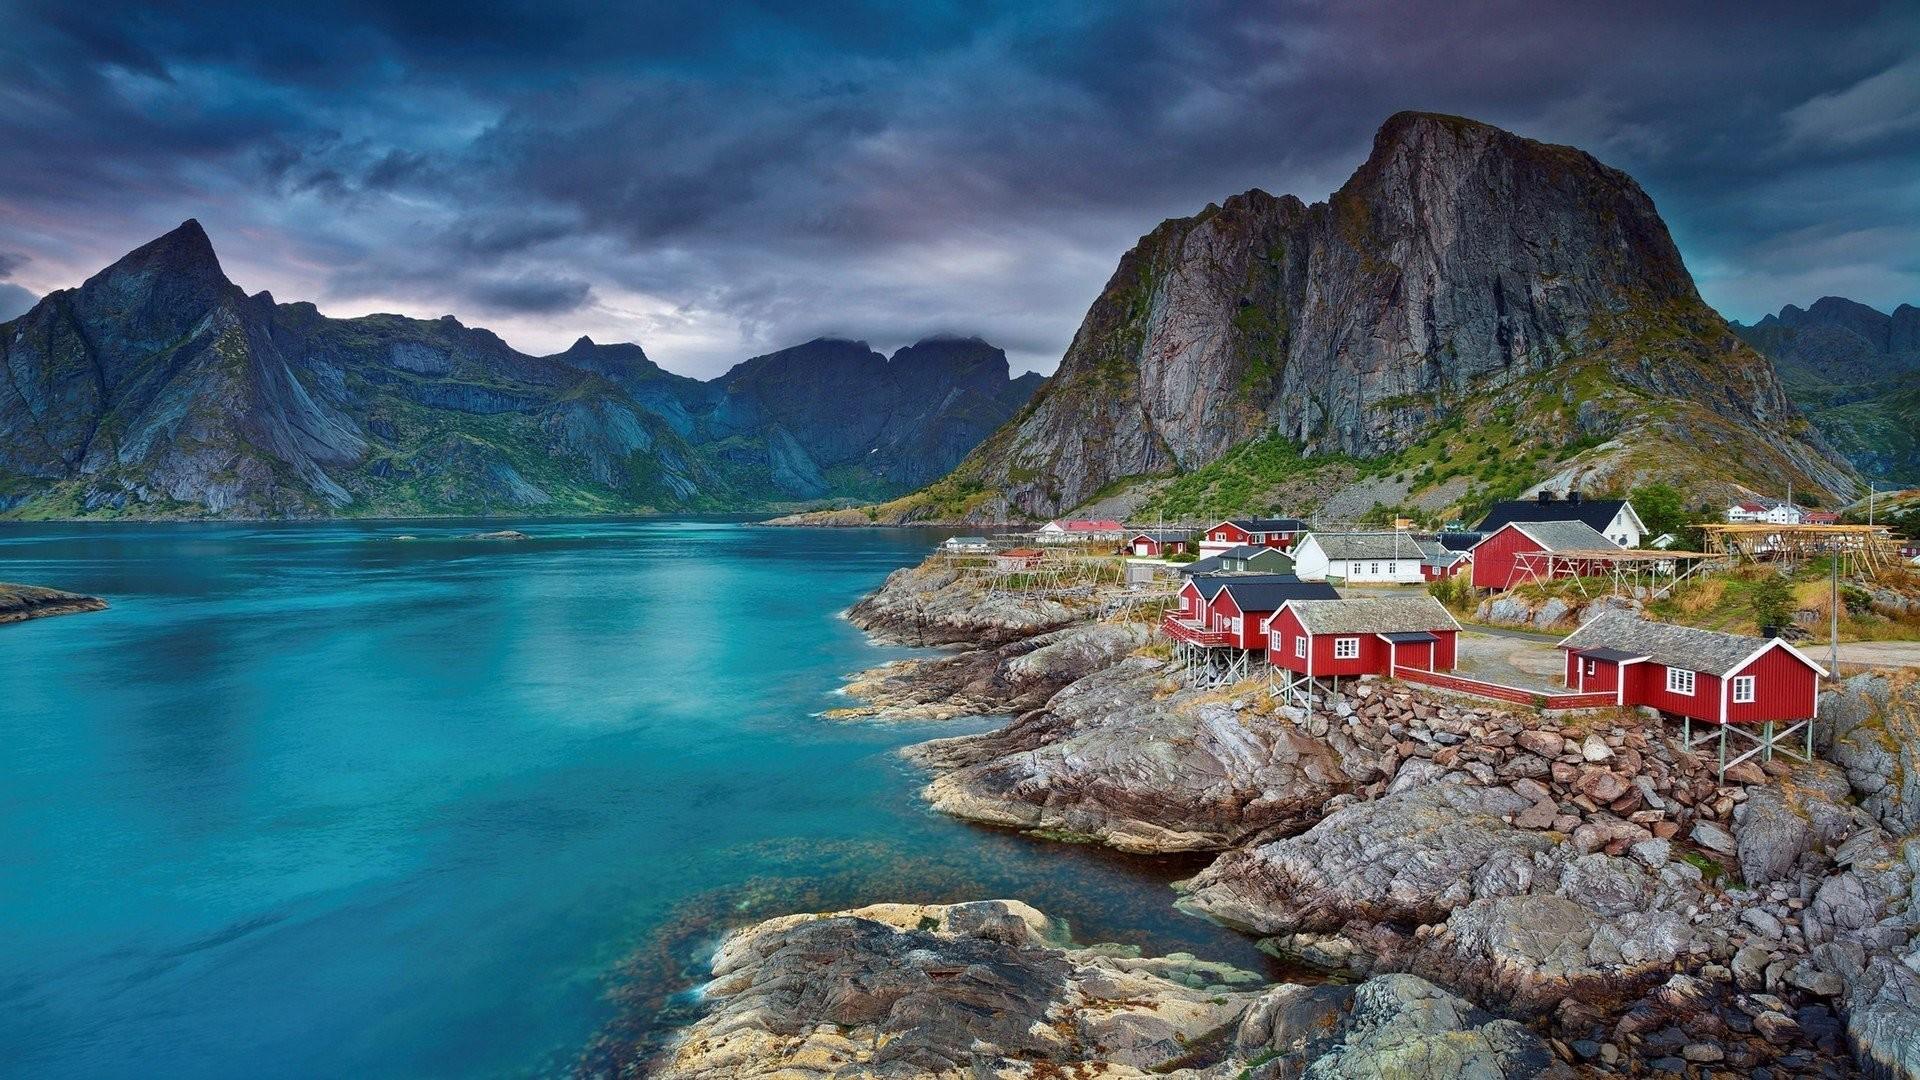 Res: 1920x1080, Lofoten Norway Summertime Images For Desktop Wallpaper